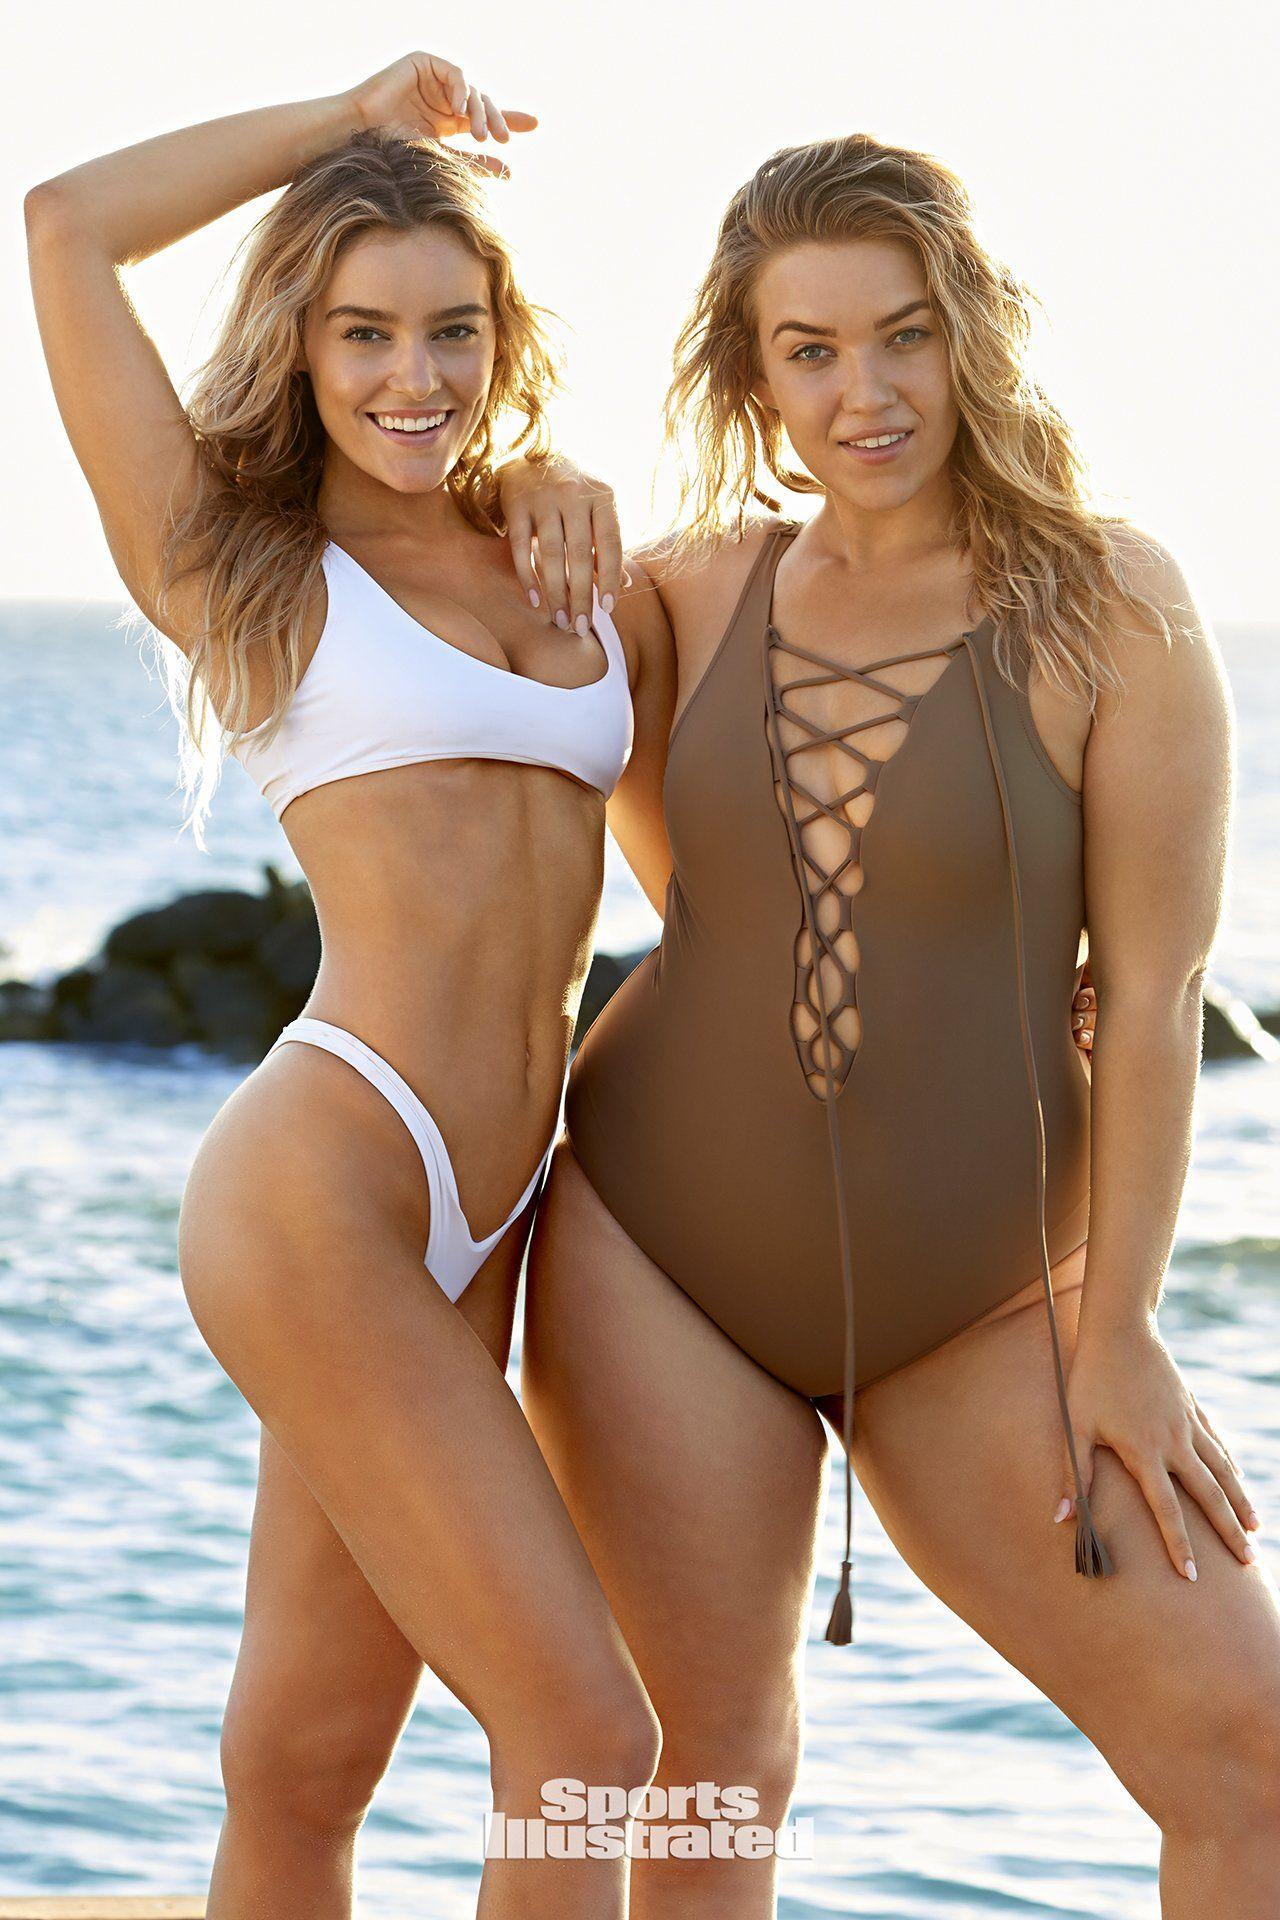 Georgia Gibbs Si Swimsuit Issue 2018